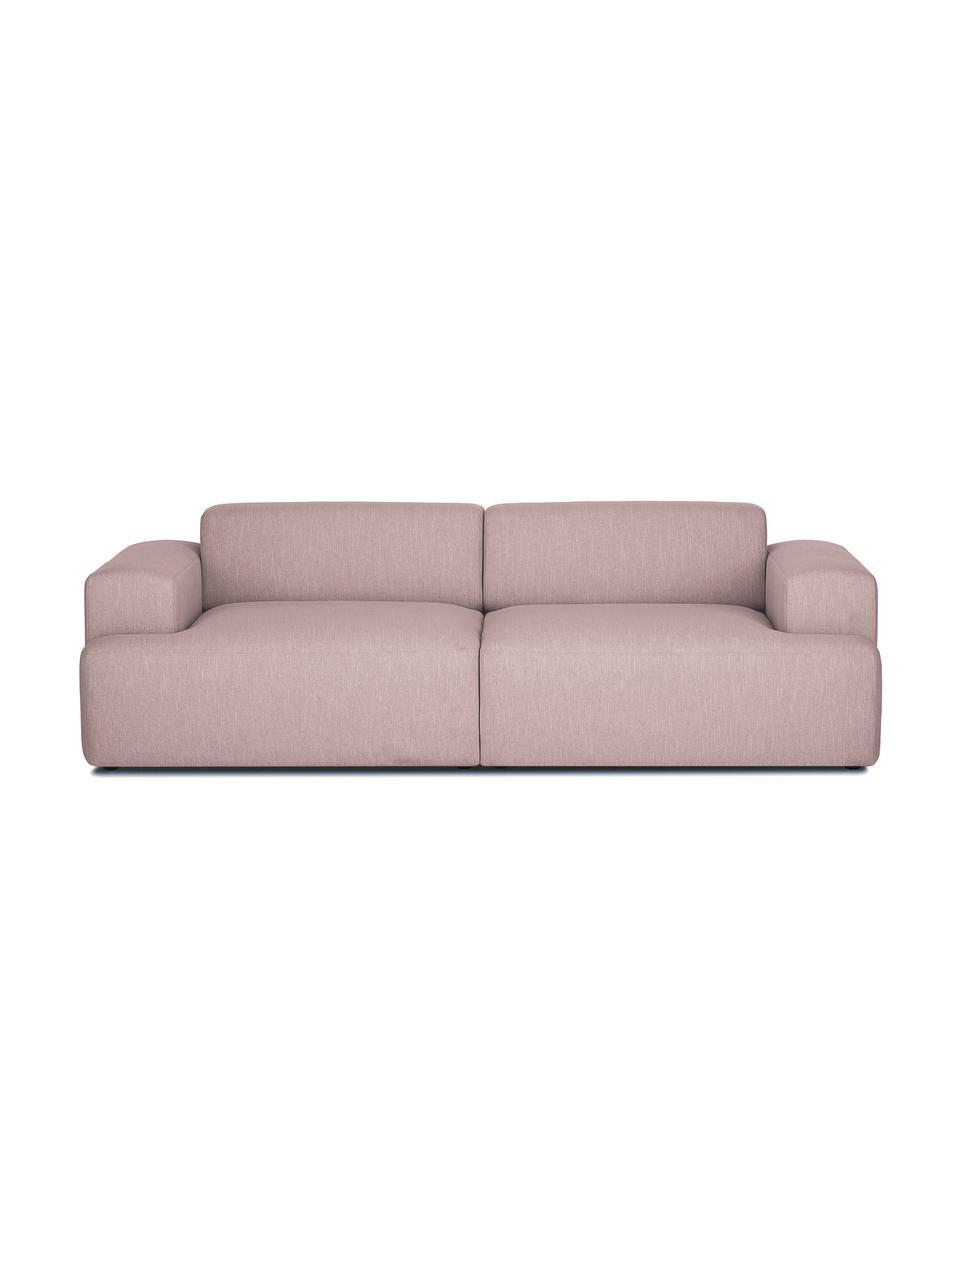 Sofa Melva (3-Sitzer) in Rosa, Bezug: Polyester Der hochwertige, Gestell: Massives Kiefernholz, Spa, Füße: Kiefernholz Die Füße befi, Webstoff Rosa, B 240 x T 101 cm